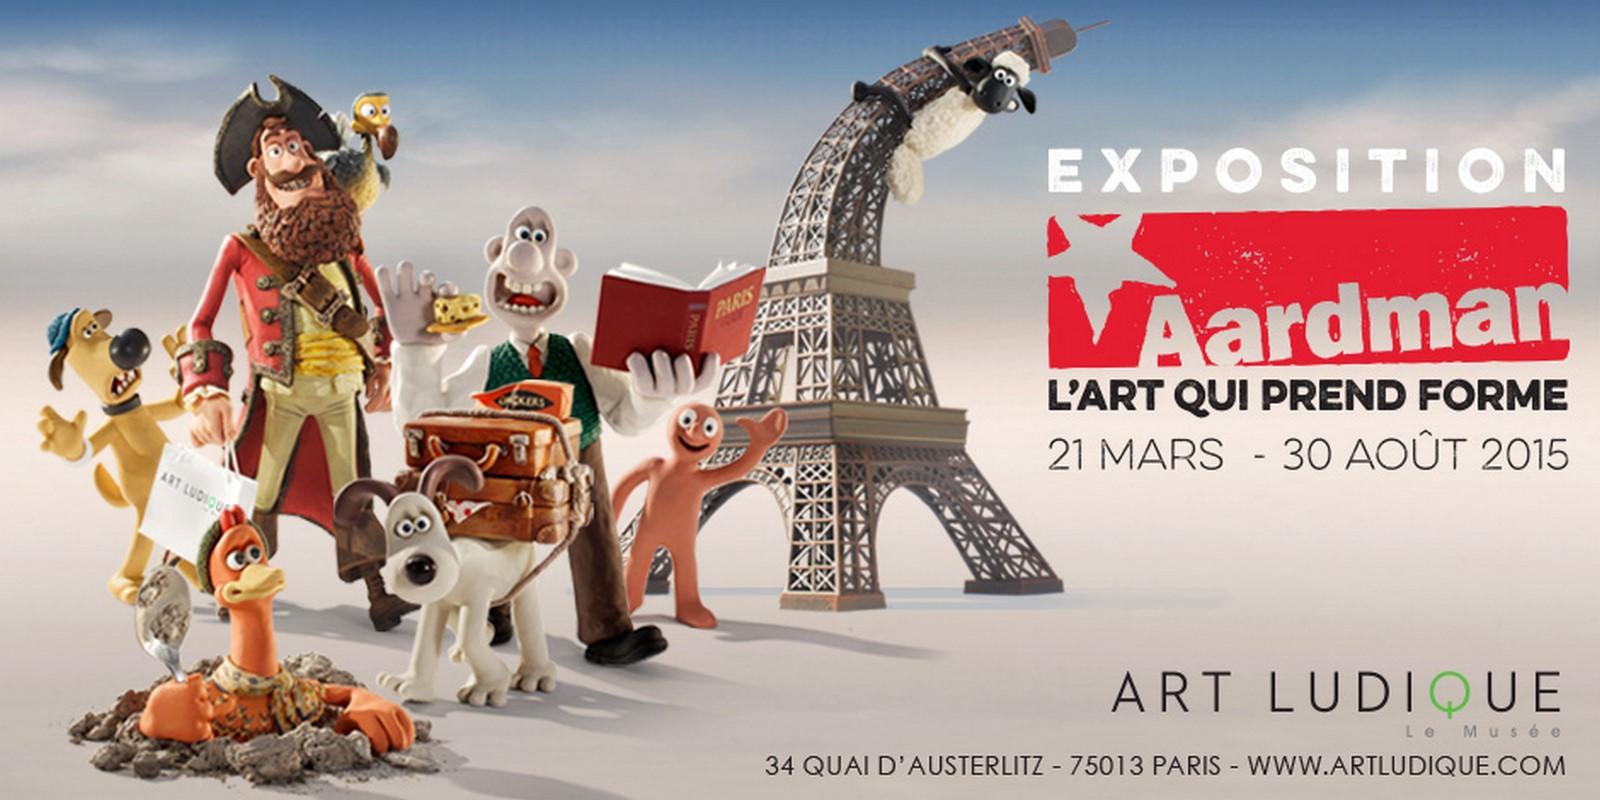 [Critique Expo] Aardman, l'art qui prend forme